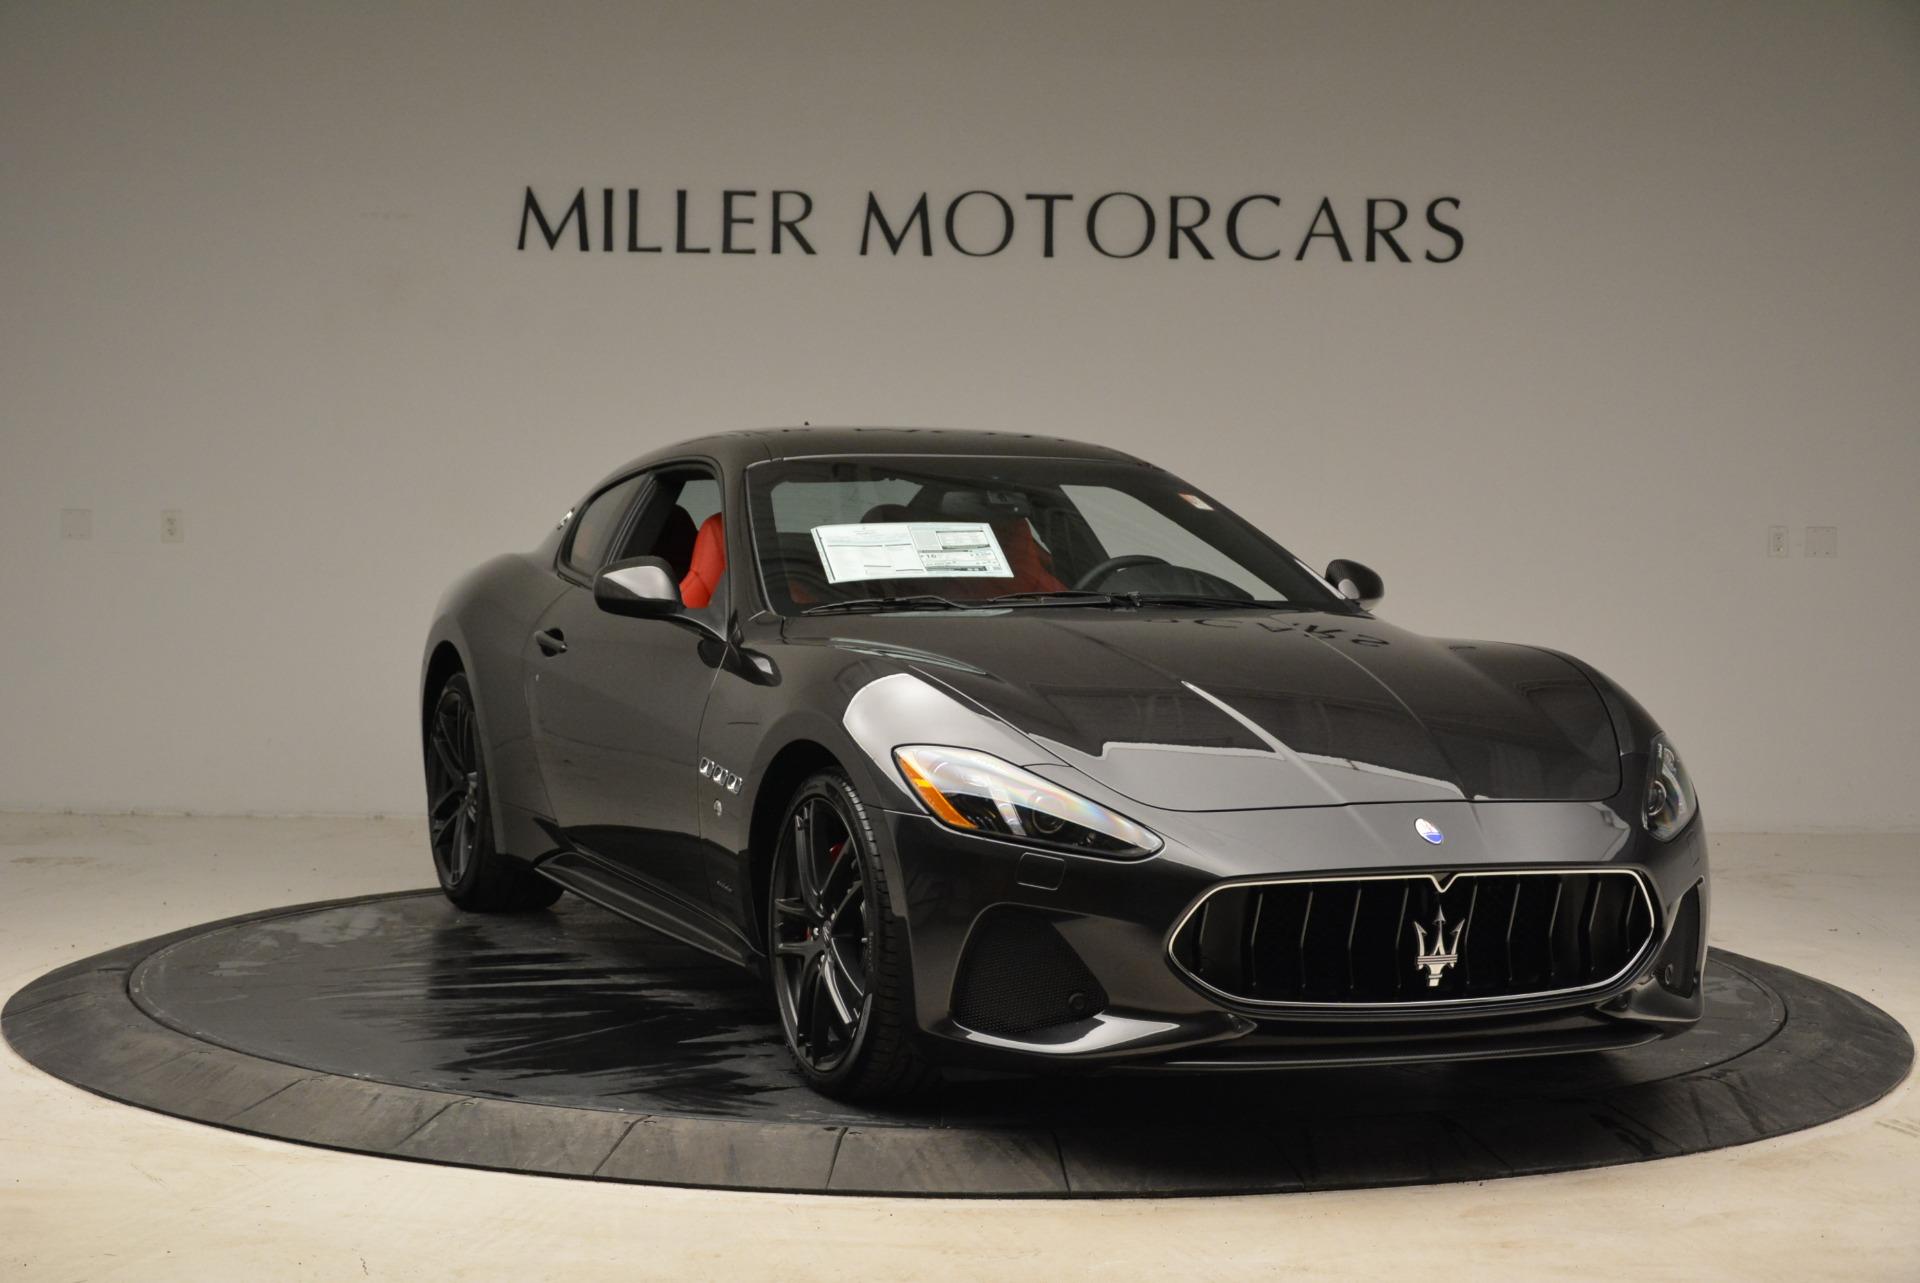 New 2018 Maserati GranTurismo Sport For Sale In Westport, CT 2426_p11